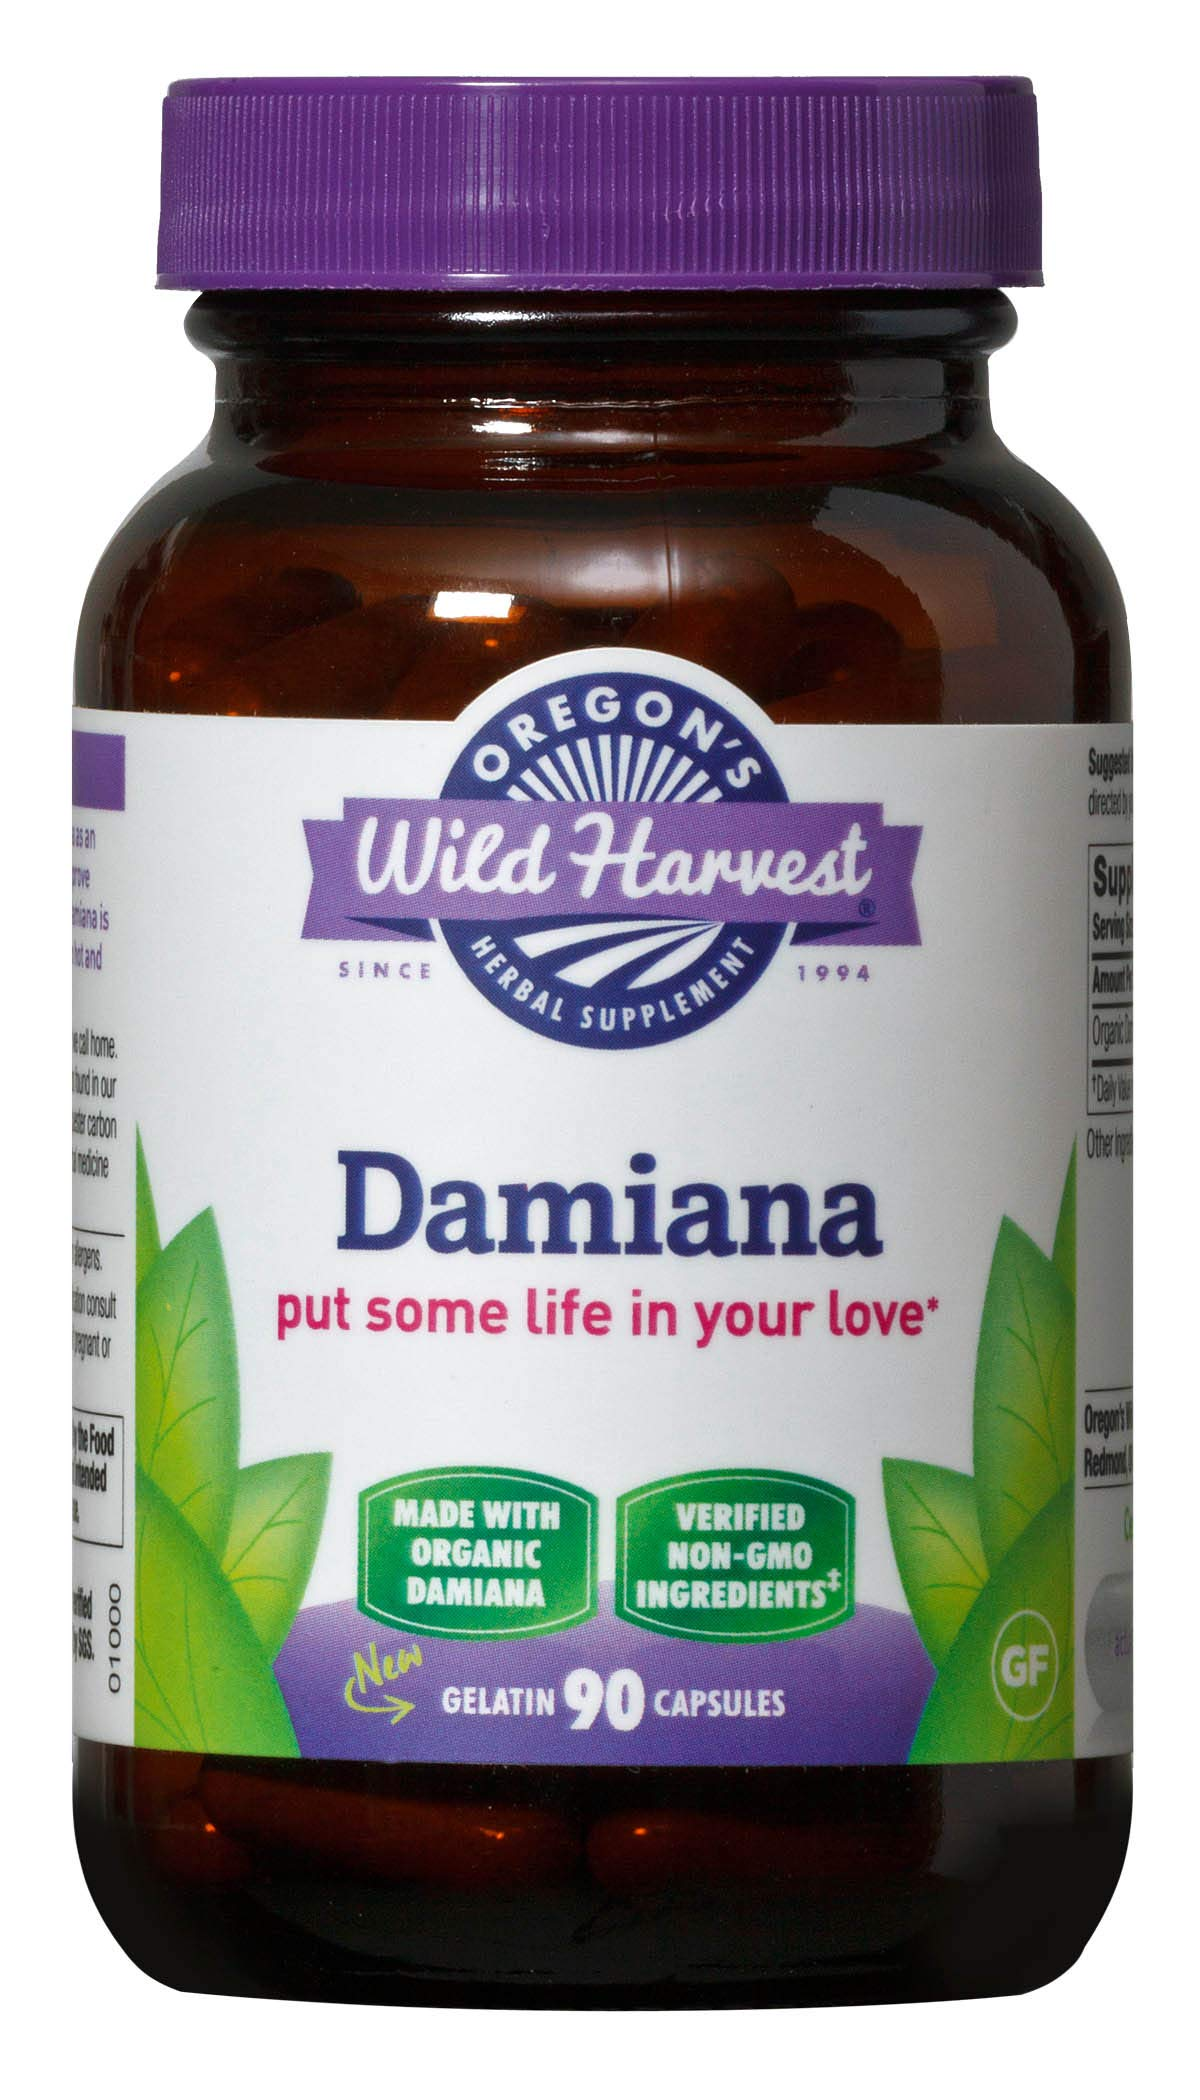 Oregon's Wild Harvest Damiana Organic Herbal Supplement, 90 Count by Oregon's Wild Harvest